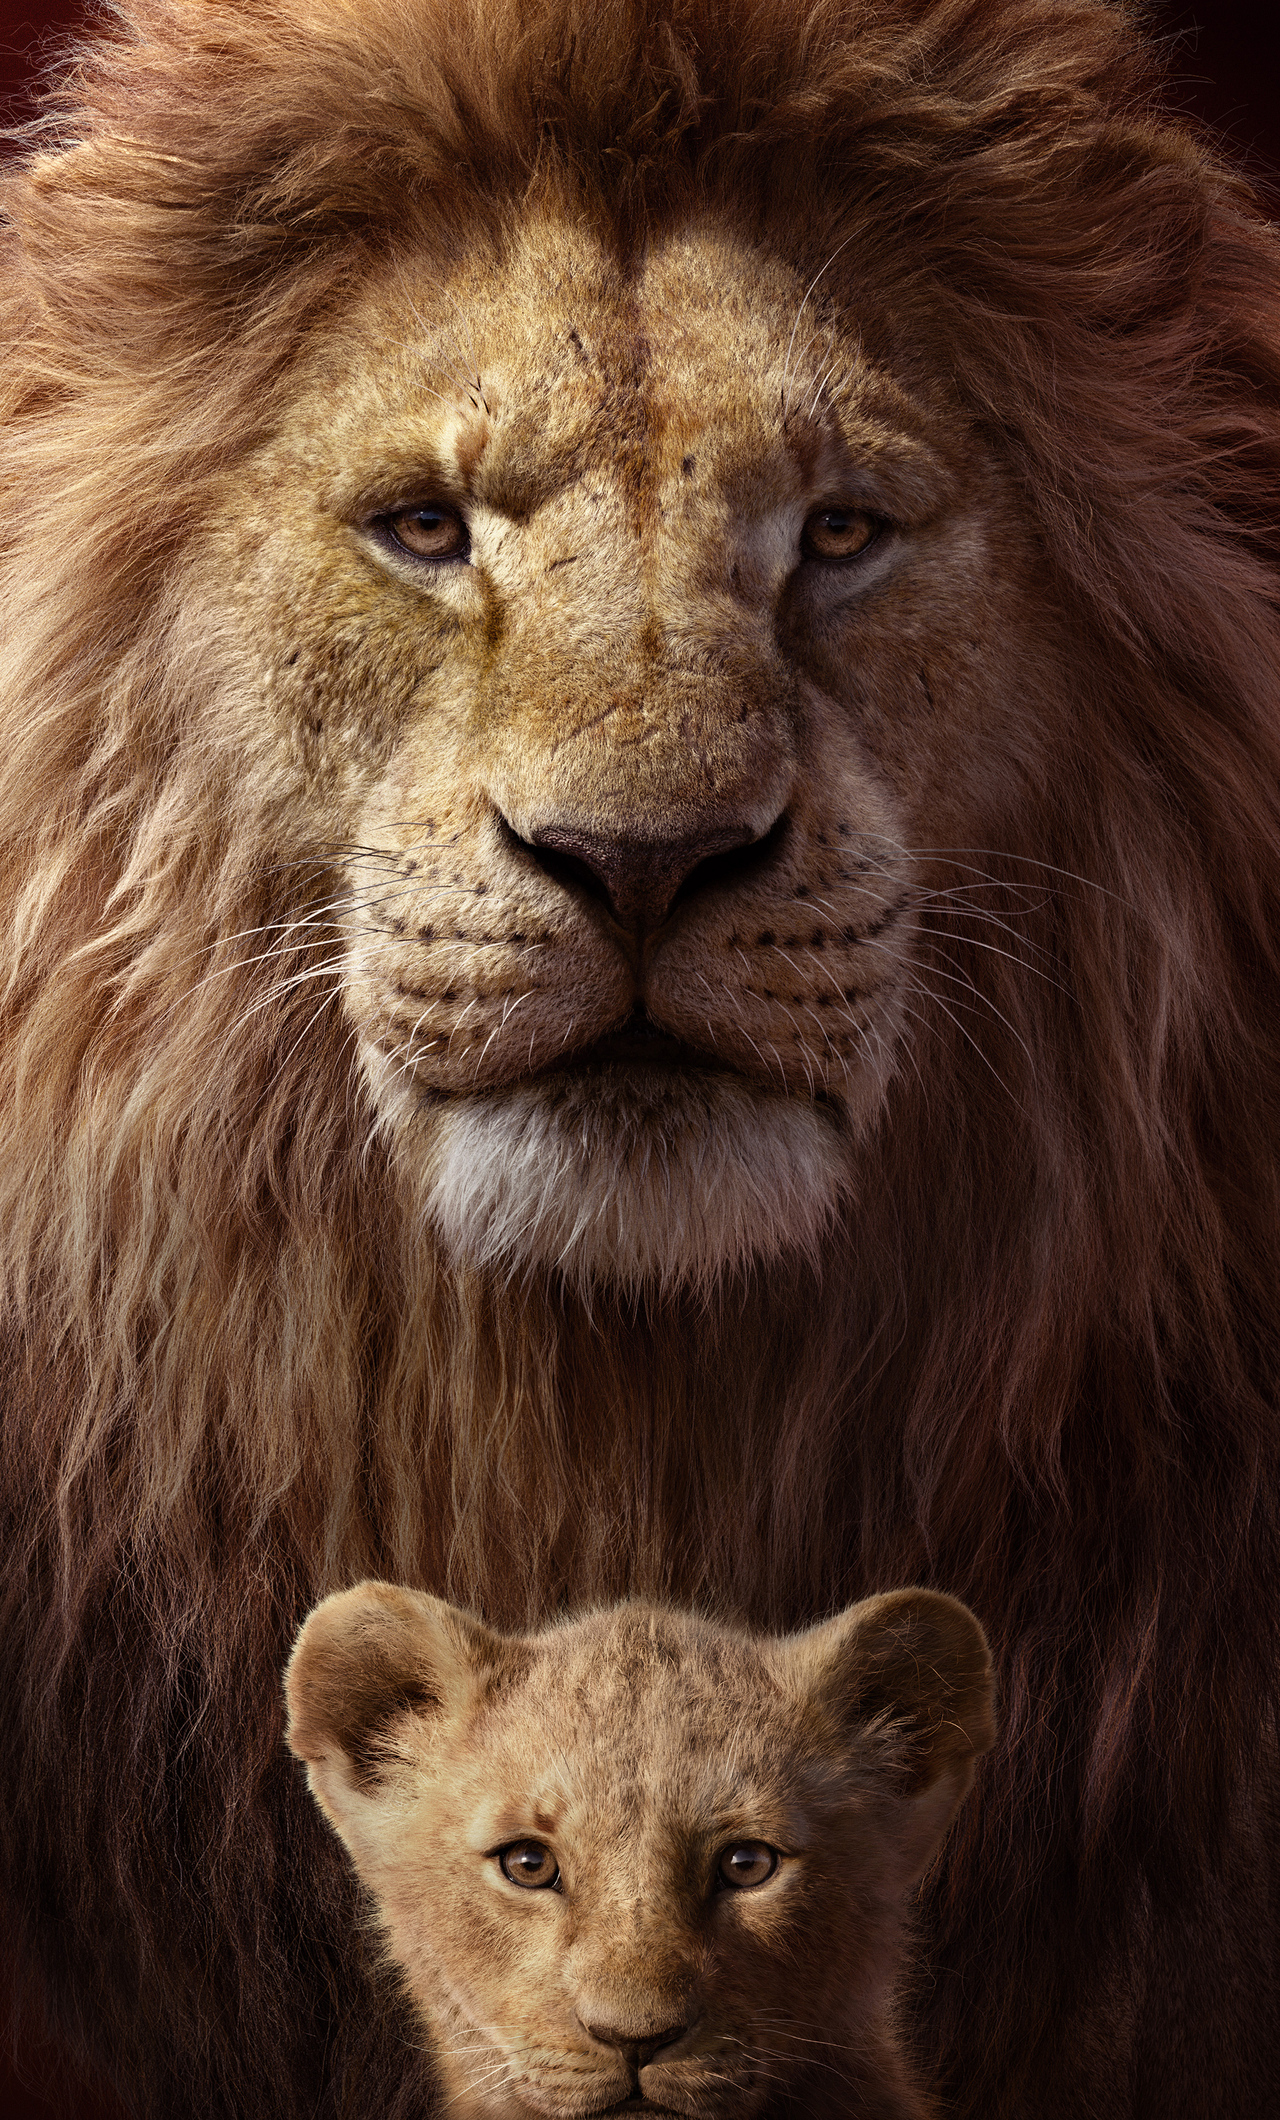 1280x2120 The Lion King Key Art 4k Iphone 6 Hd 4k